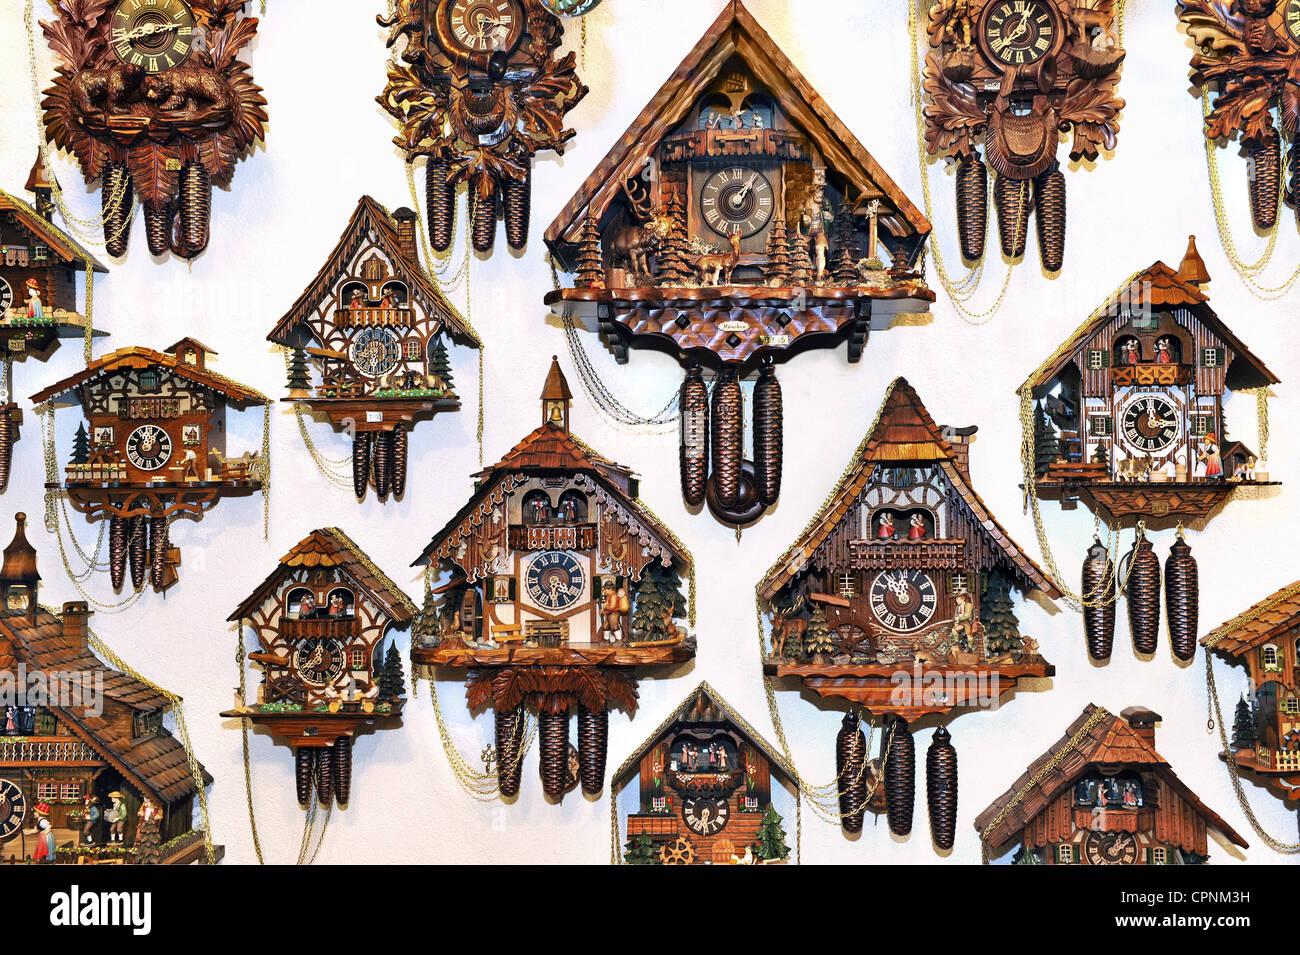 clock cuckoo clock Black Forest cuckoo clocks hanging on the wall